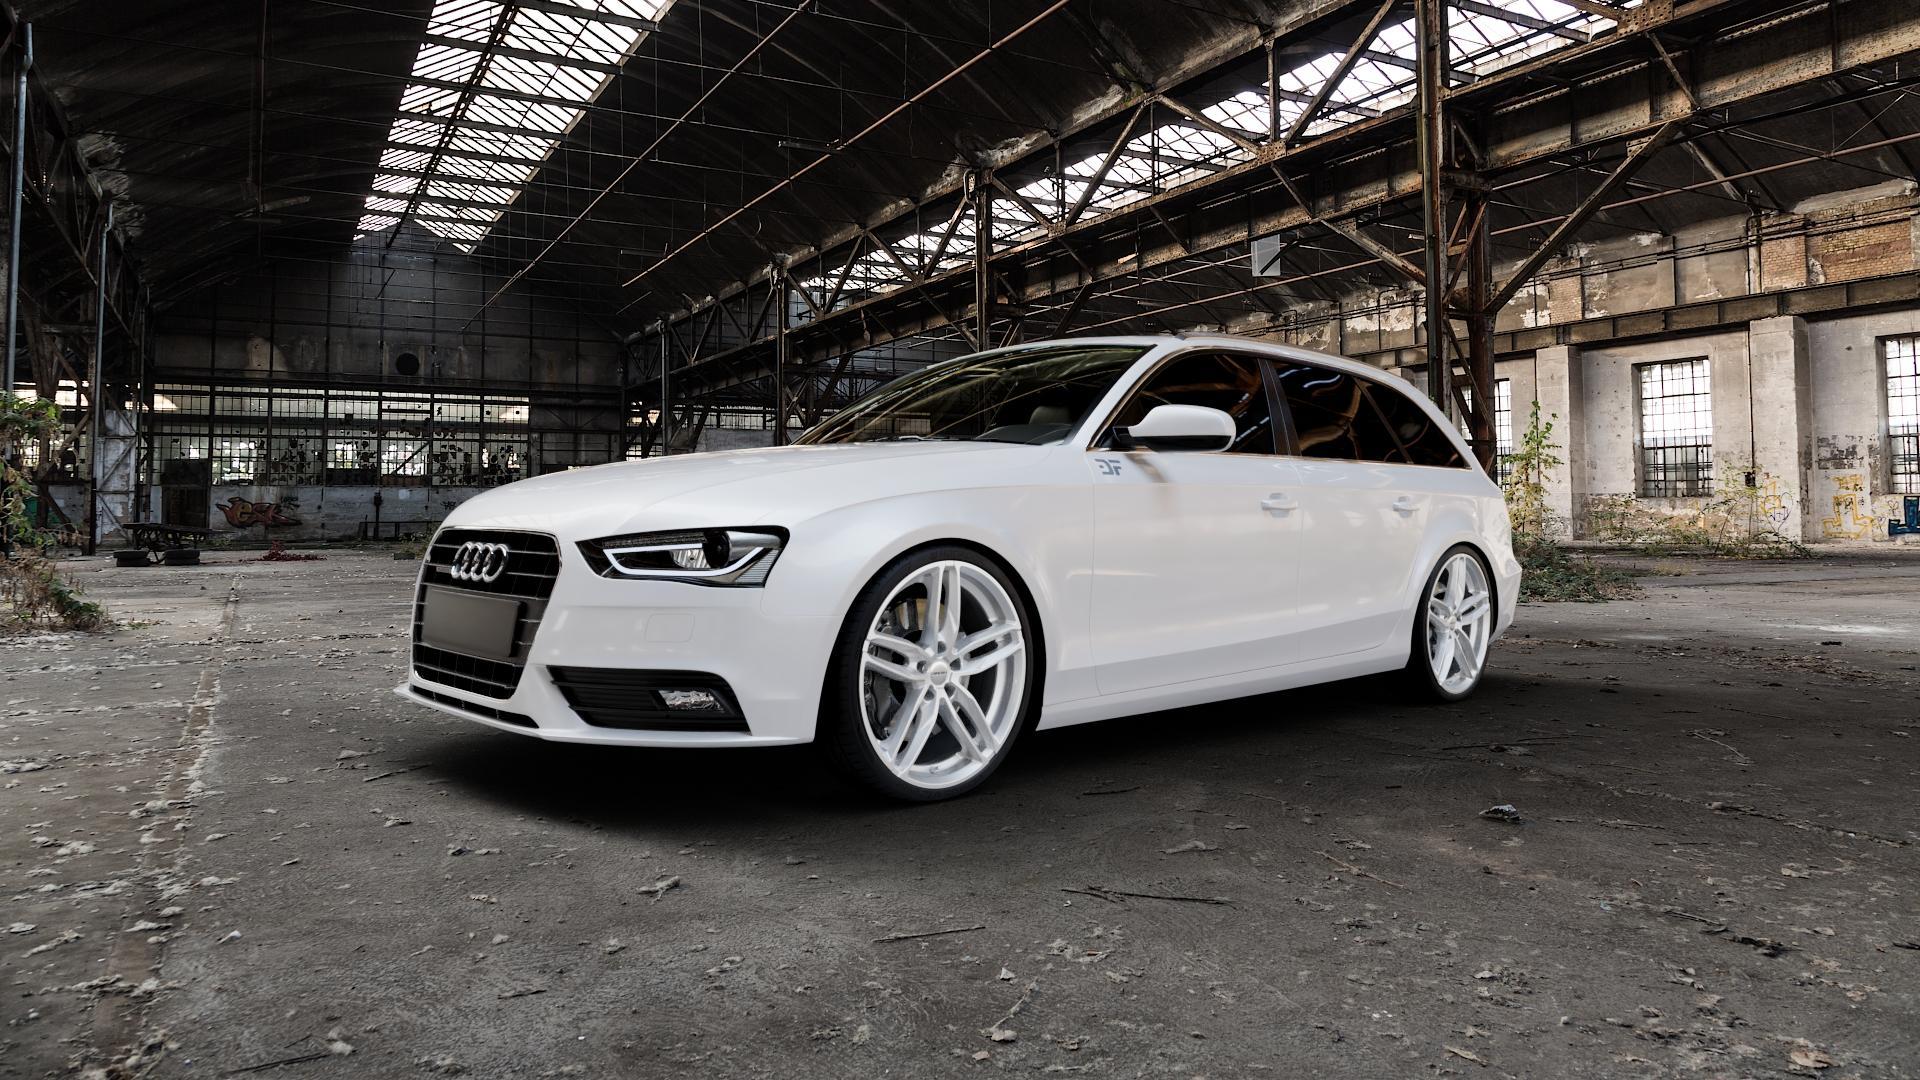 CARMANI 13 Twinmax white silver Felge mit Reifen silber weiss in 20Zoll Winterfelge Alufelge auf weissem Audi A4 Typ 8K5/B8 (Avant) Facelift ⬇️ mit 15mm Tieferlegung ⬇️ Industriehalle 1 Camera_000